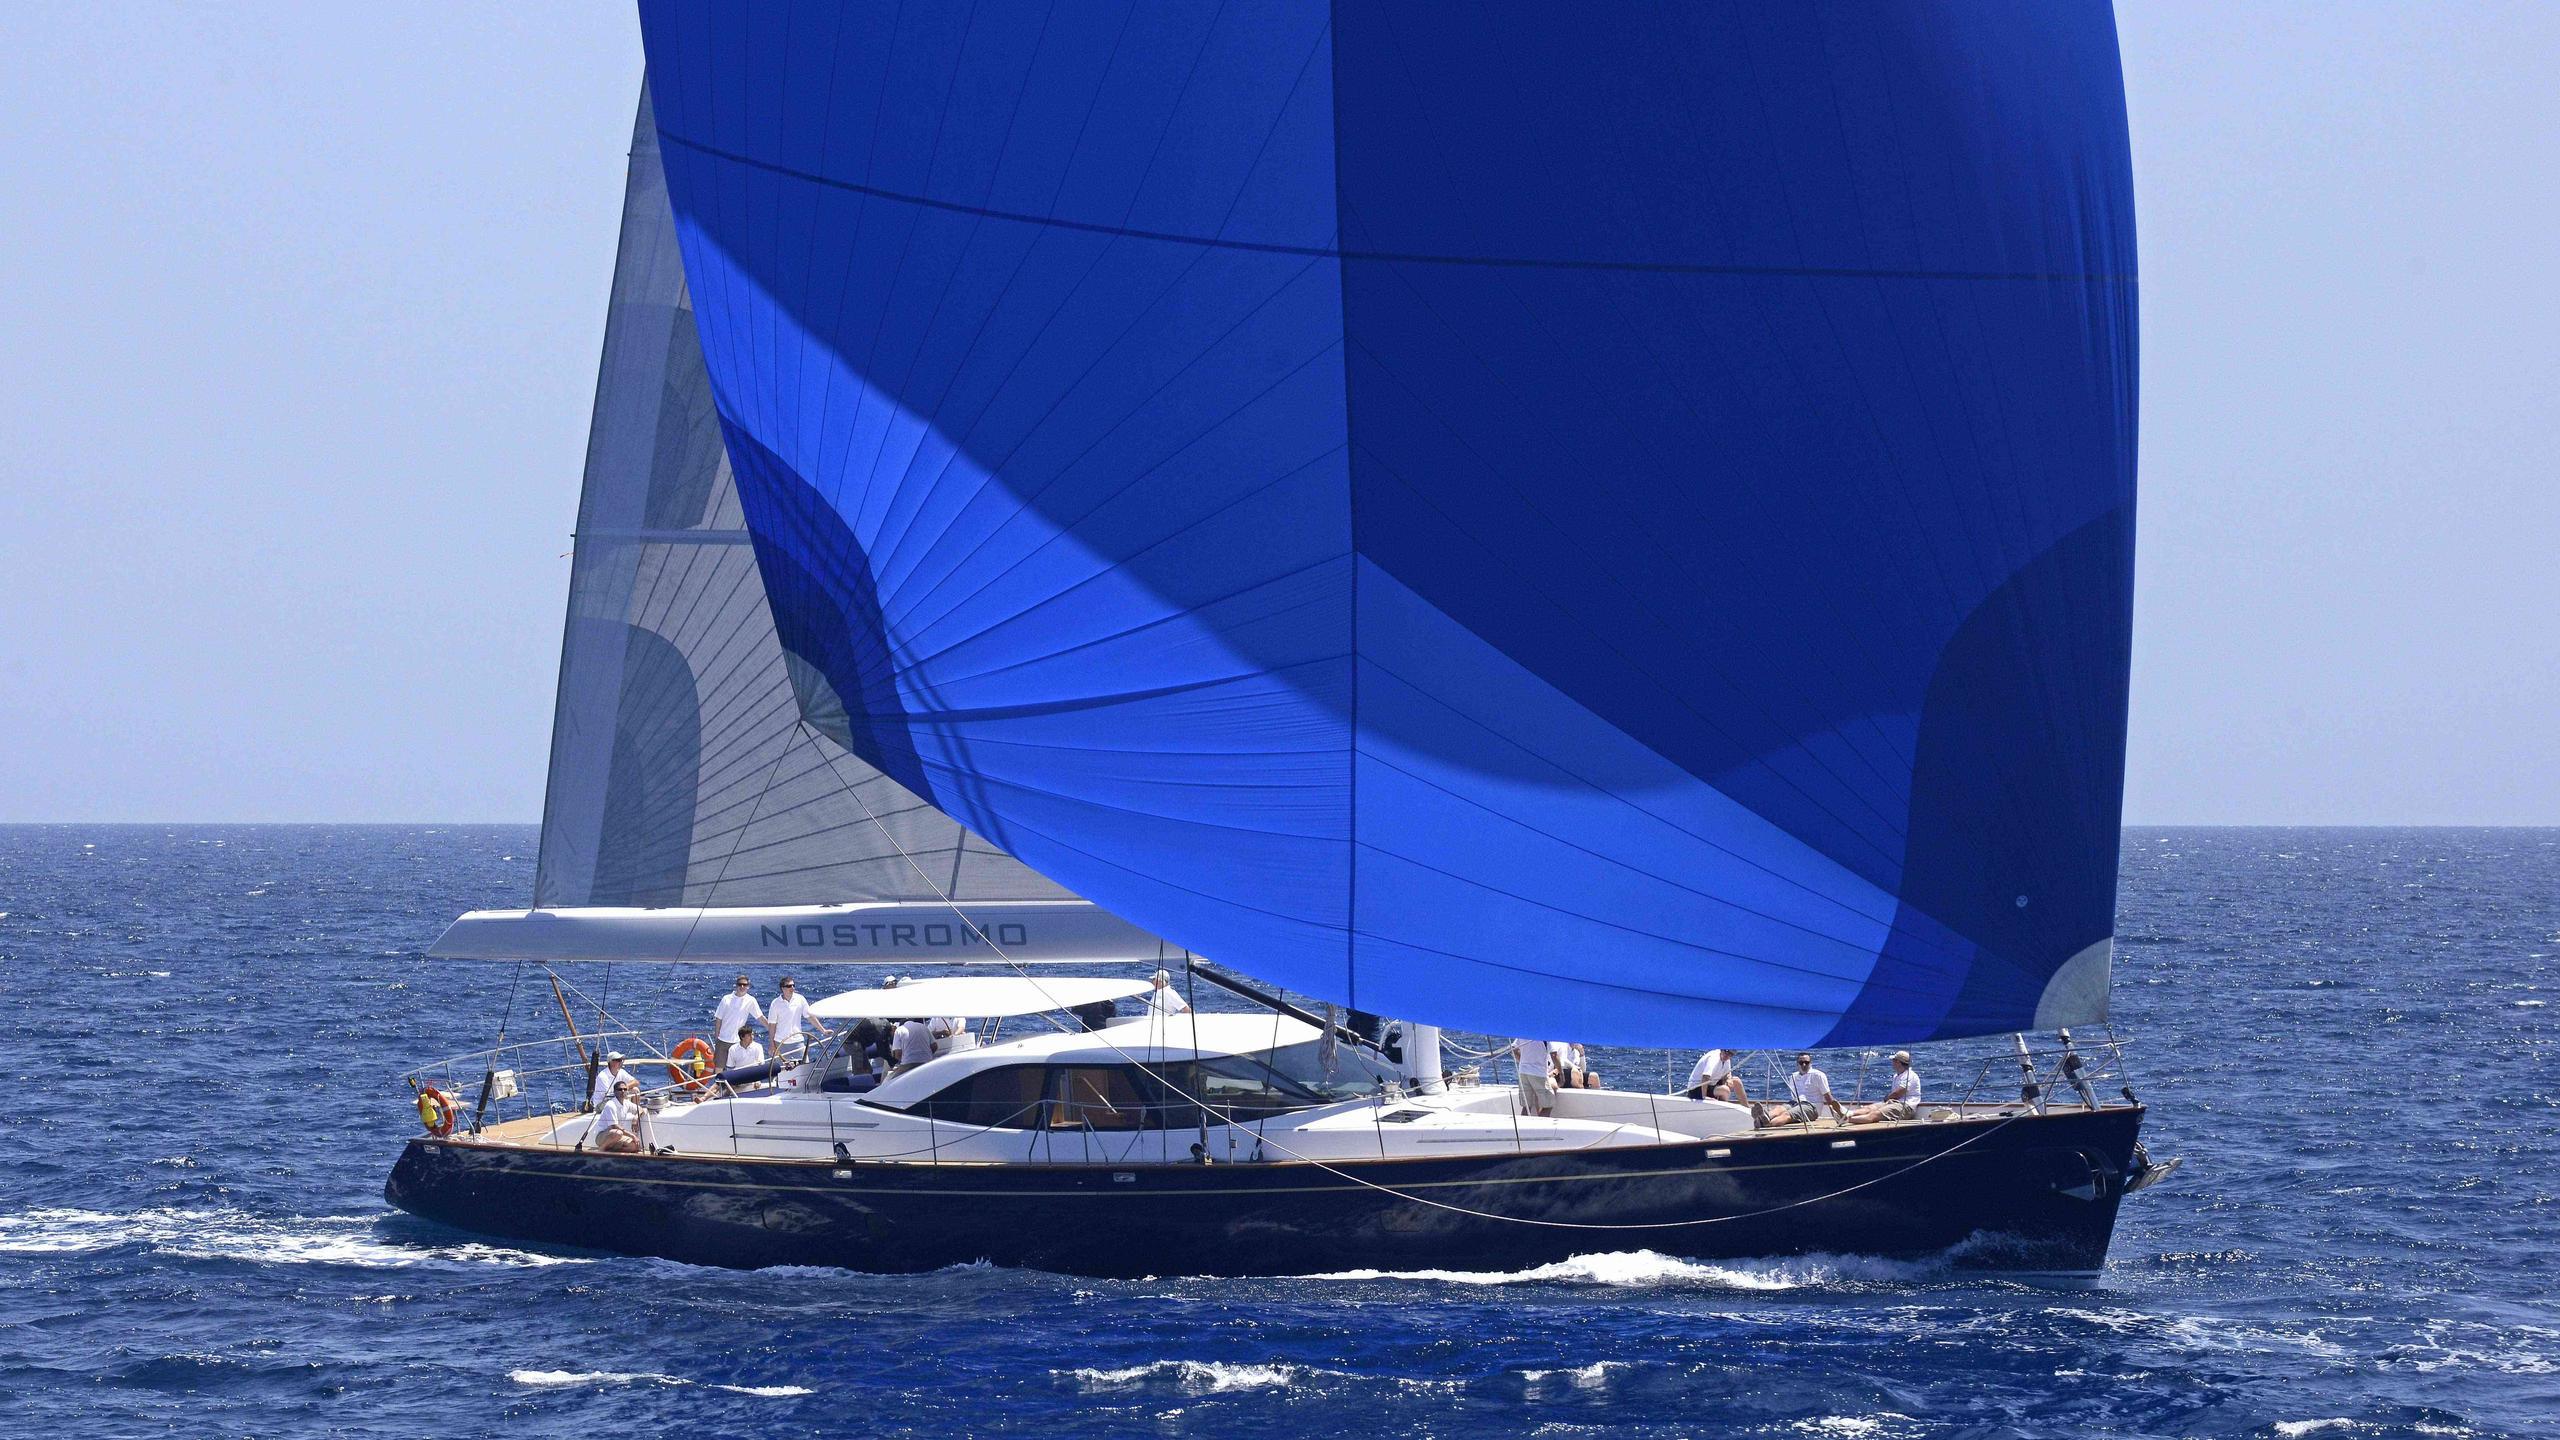 Nostromo sailing yacht